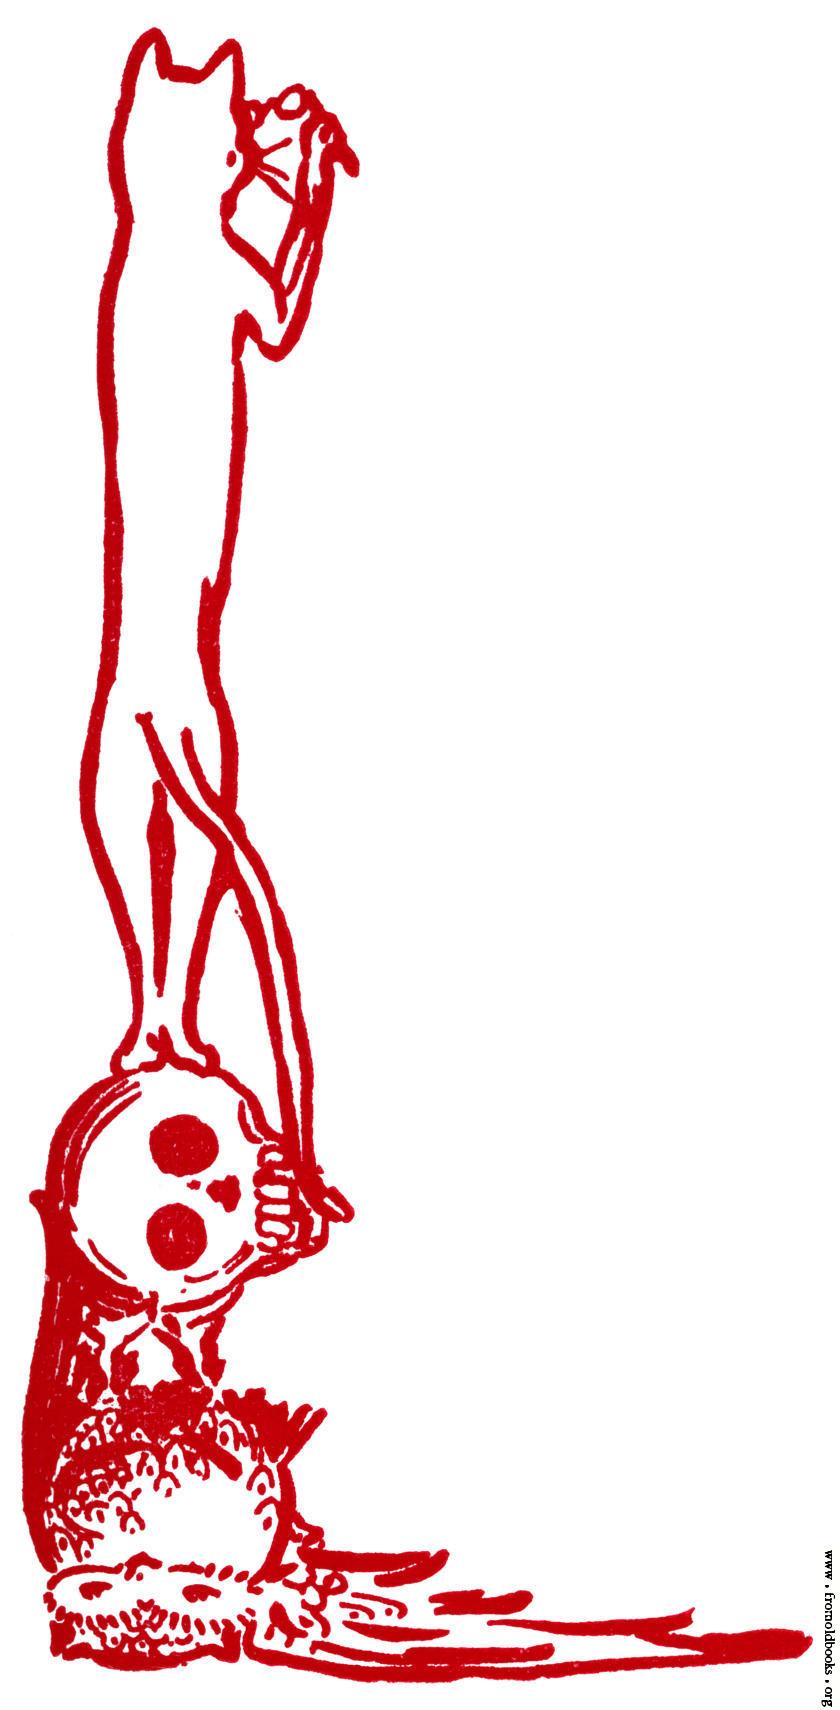 Free Spooky Borders, Download Free Clip Art, Free Clip Art ... | 840 x 1710 jpeg 131kB